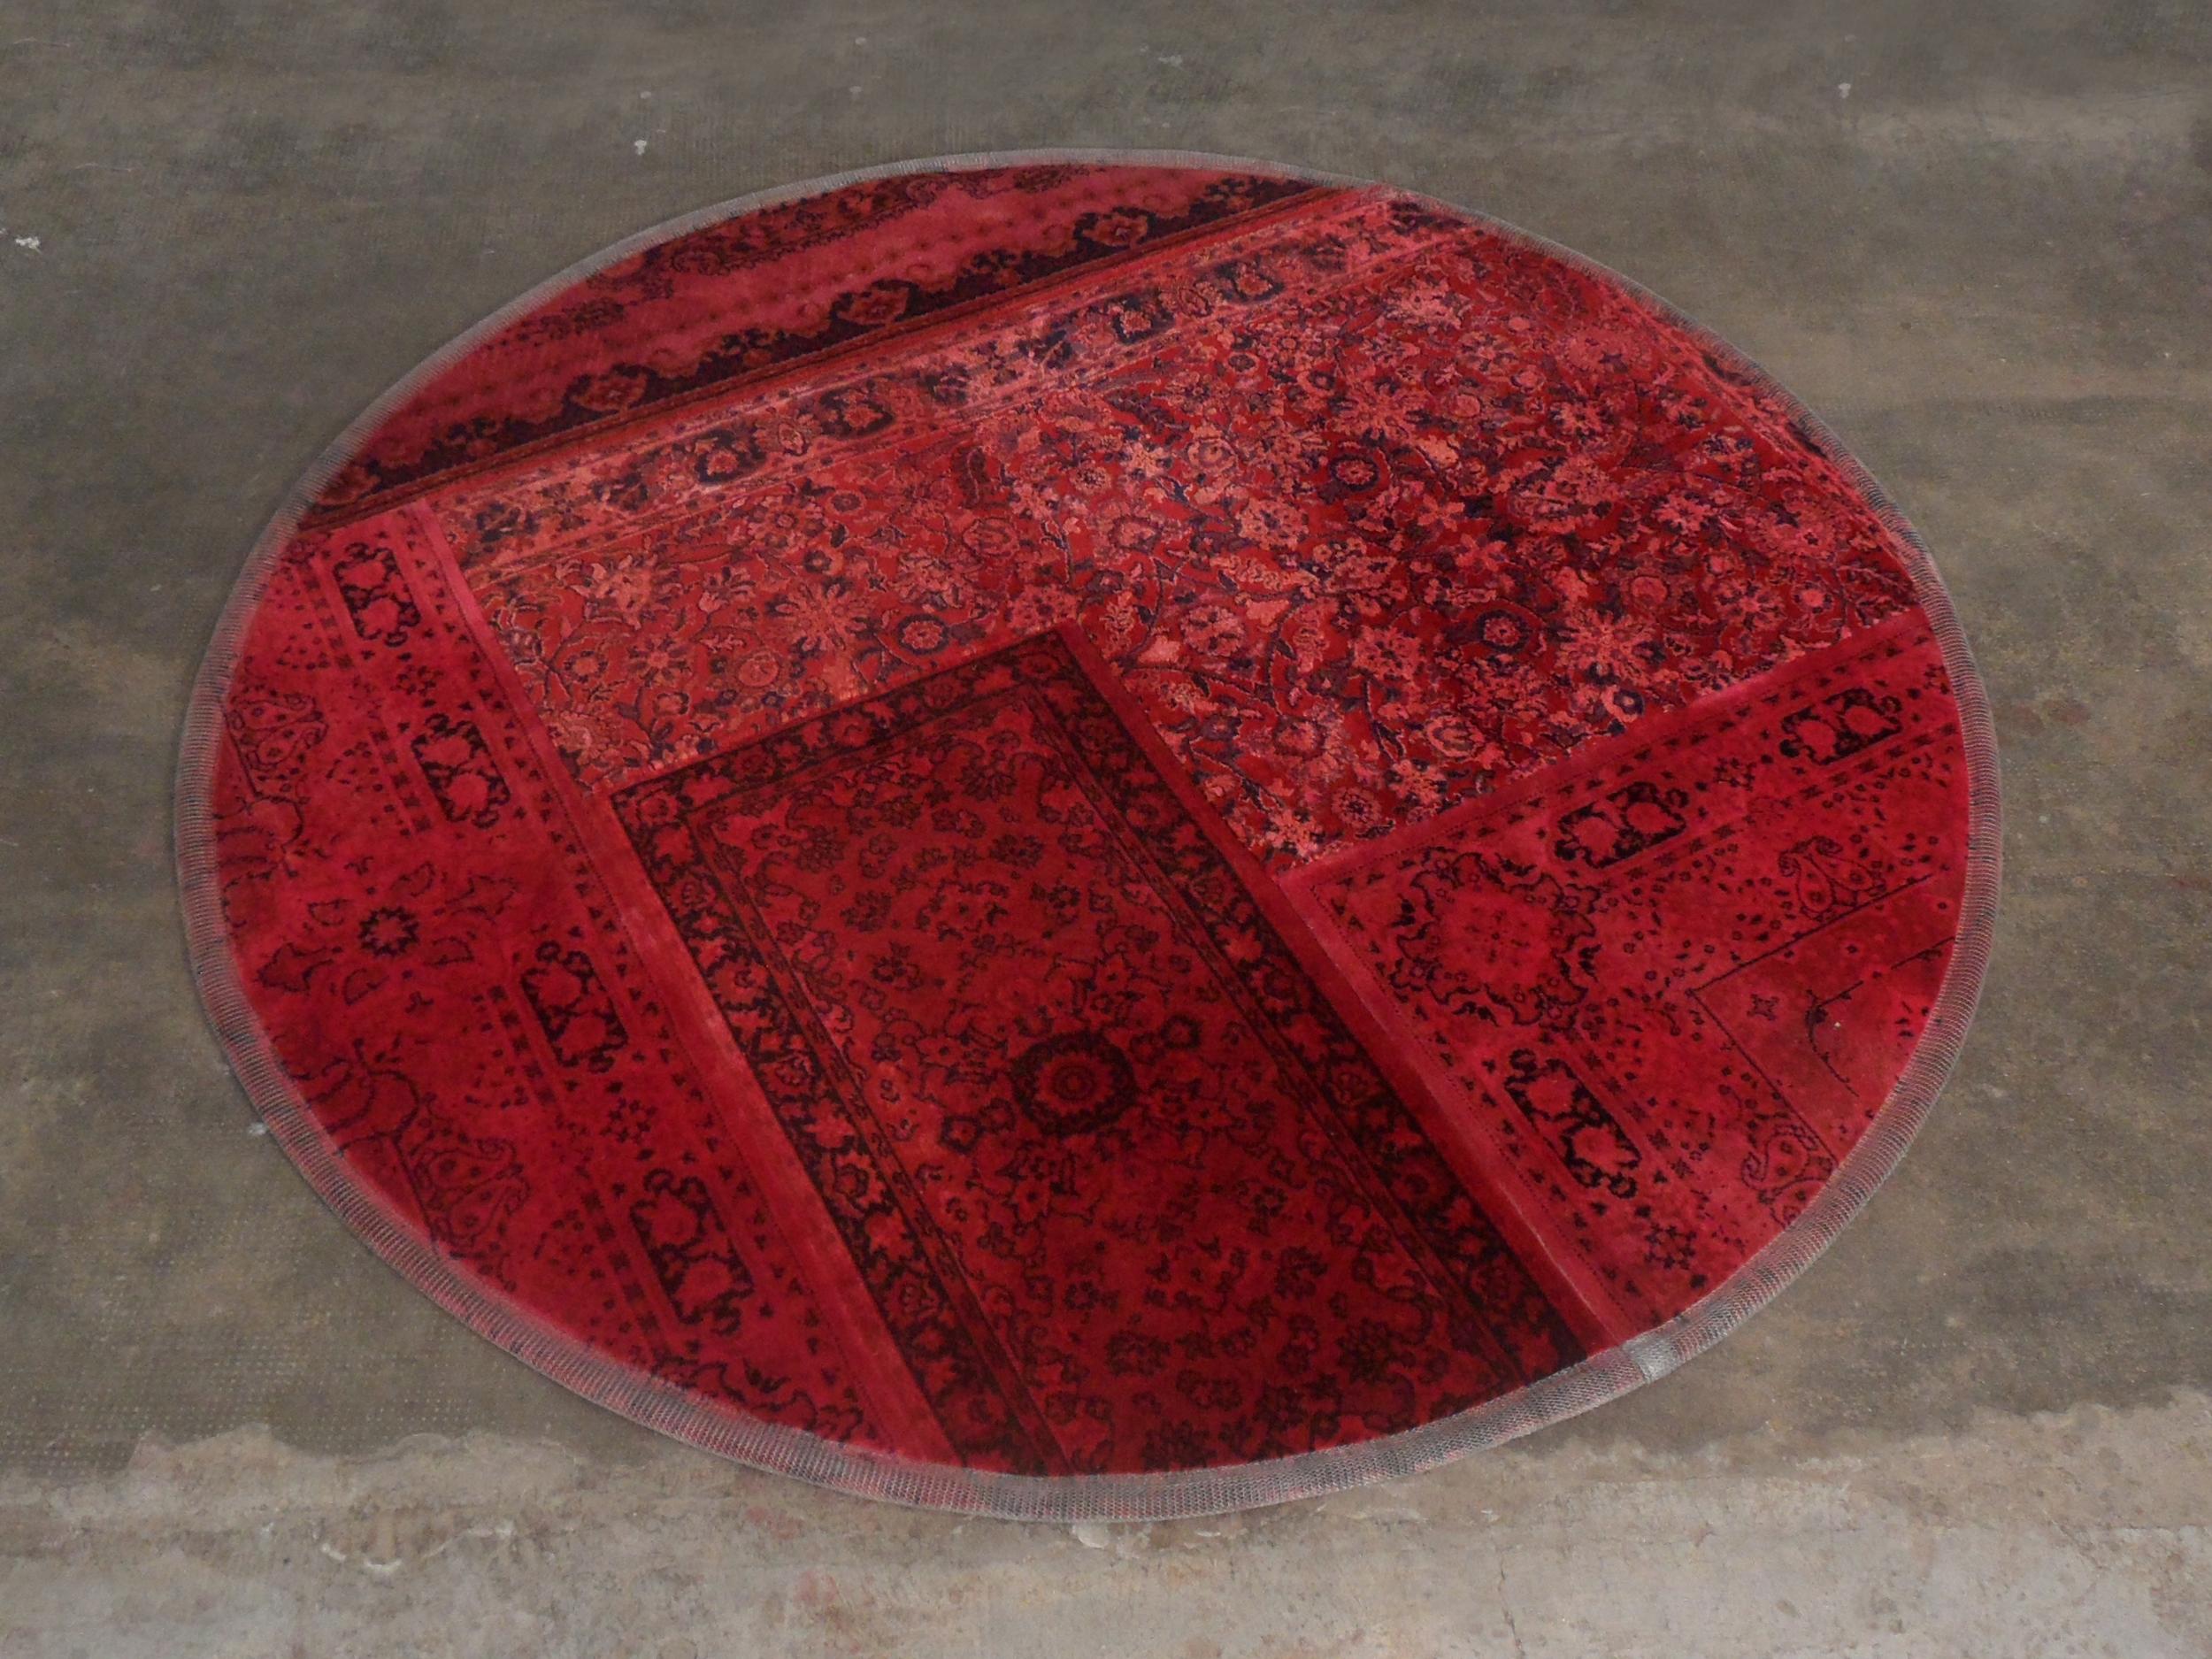 ORVETT for DIESEL - ROUND PATCHWORK CARPET, red painted